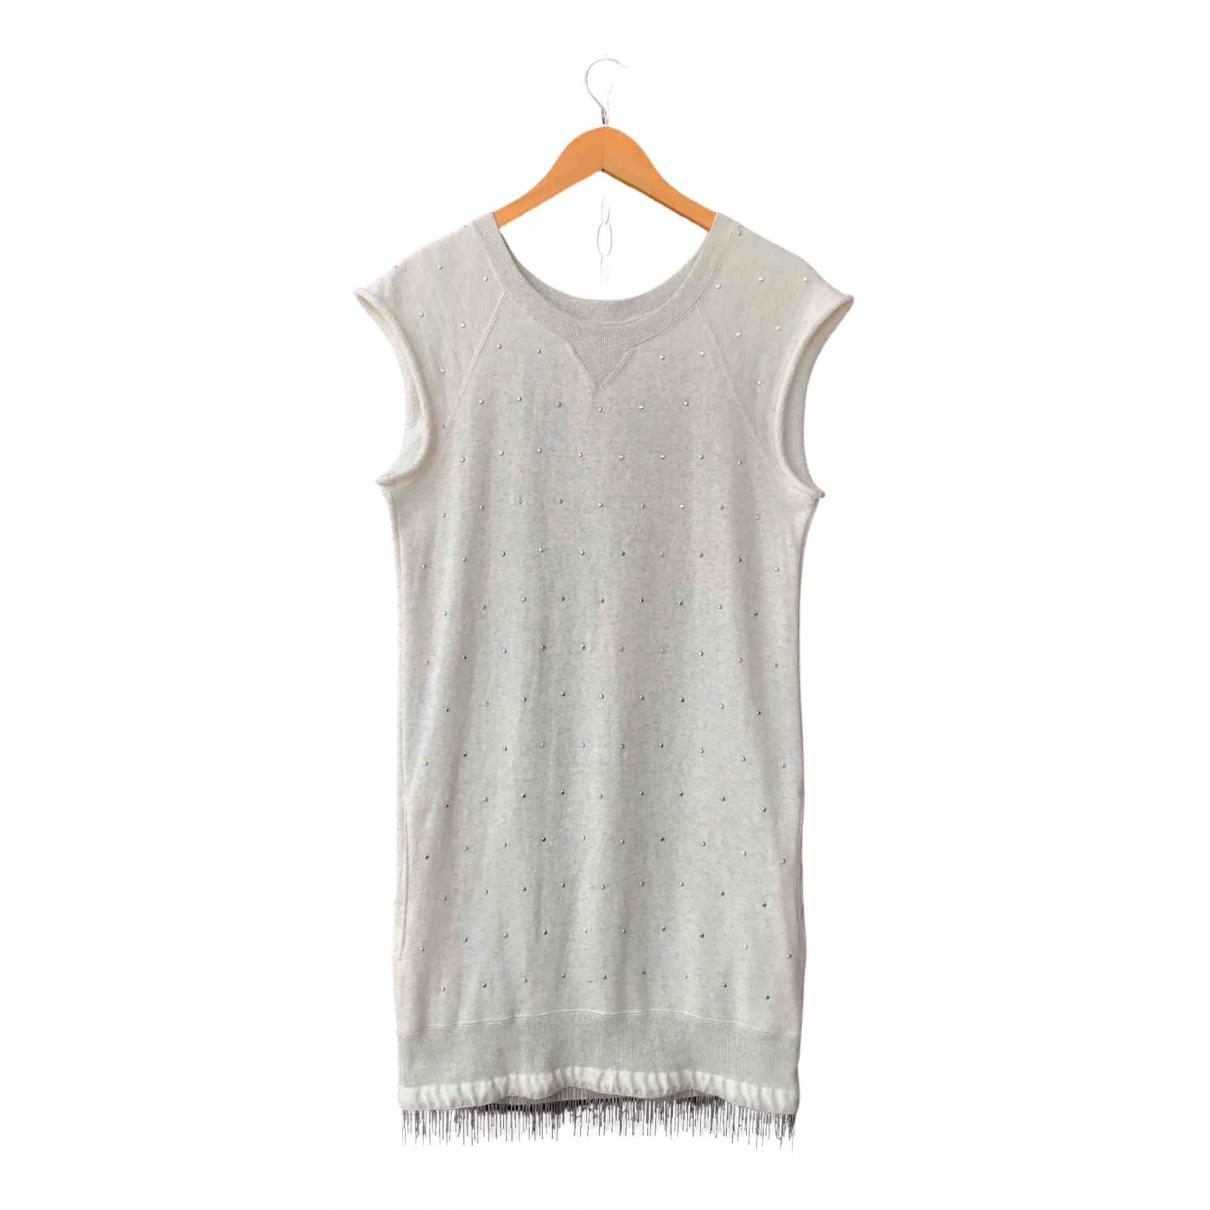 Sacai \N Grey Cotton dress for Women 4 0-5